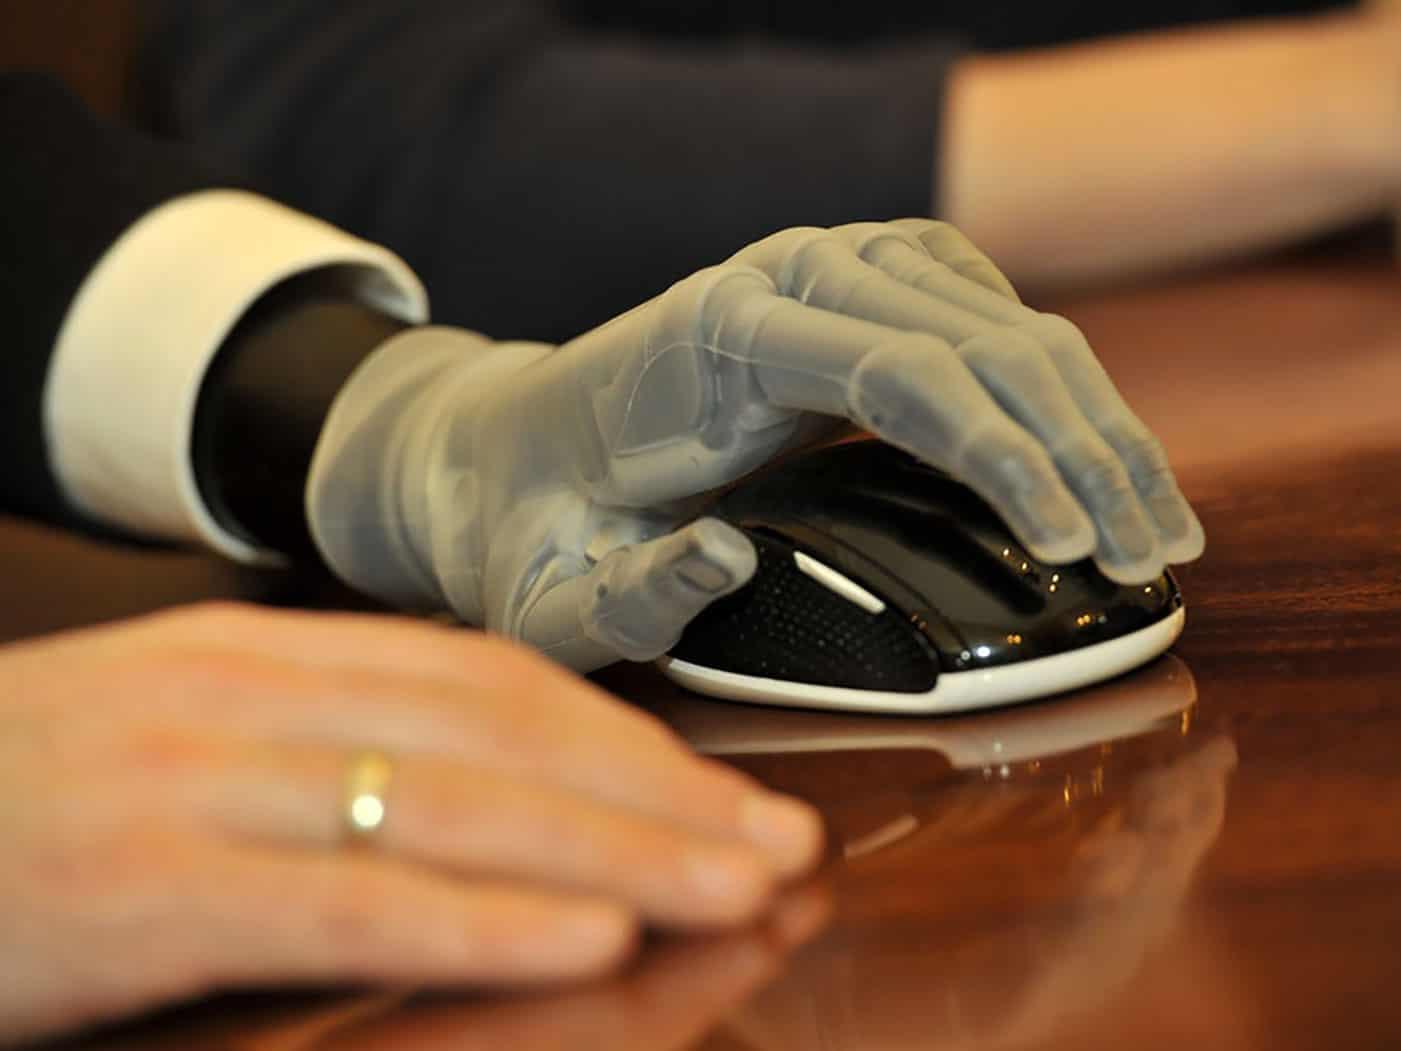 presidio neri team - protesi mano e mouse